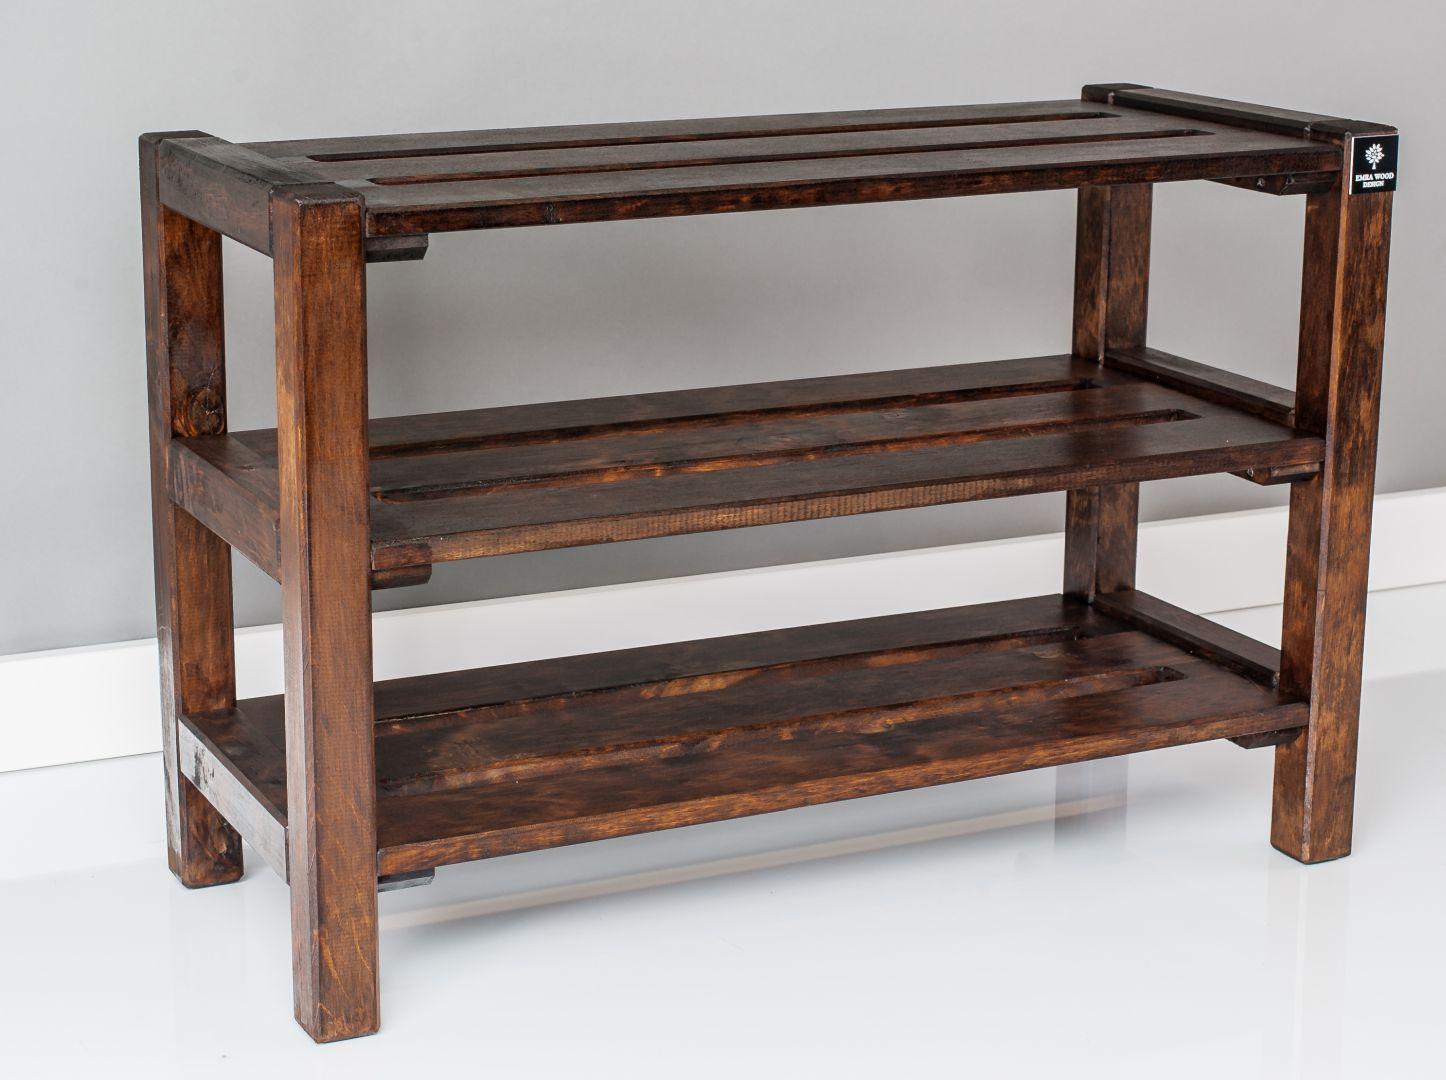 Rd 3g Regal Szafka Na Buty Orzech Drewno Lite Decor Cool Items Shelves